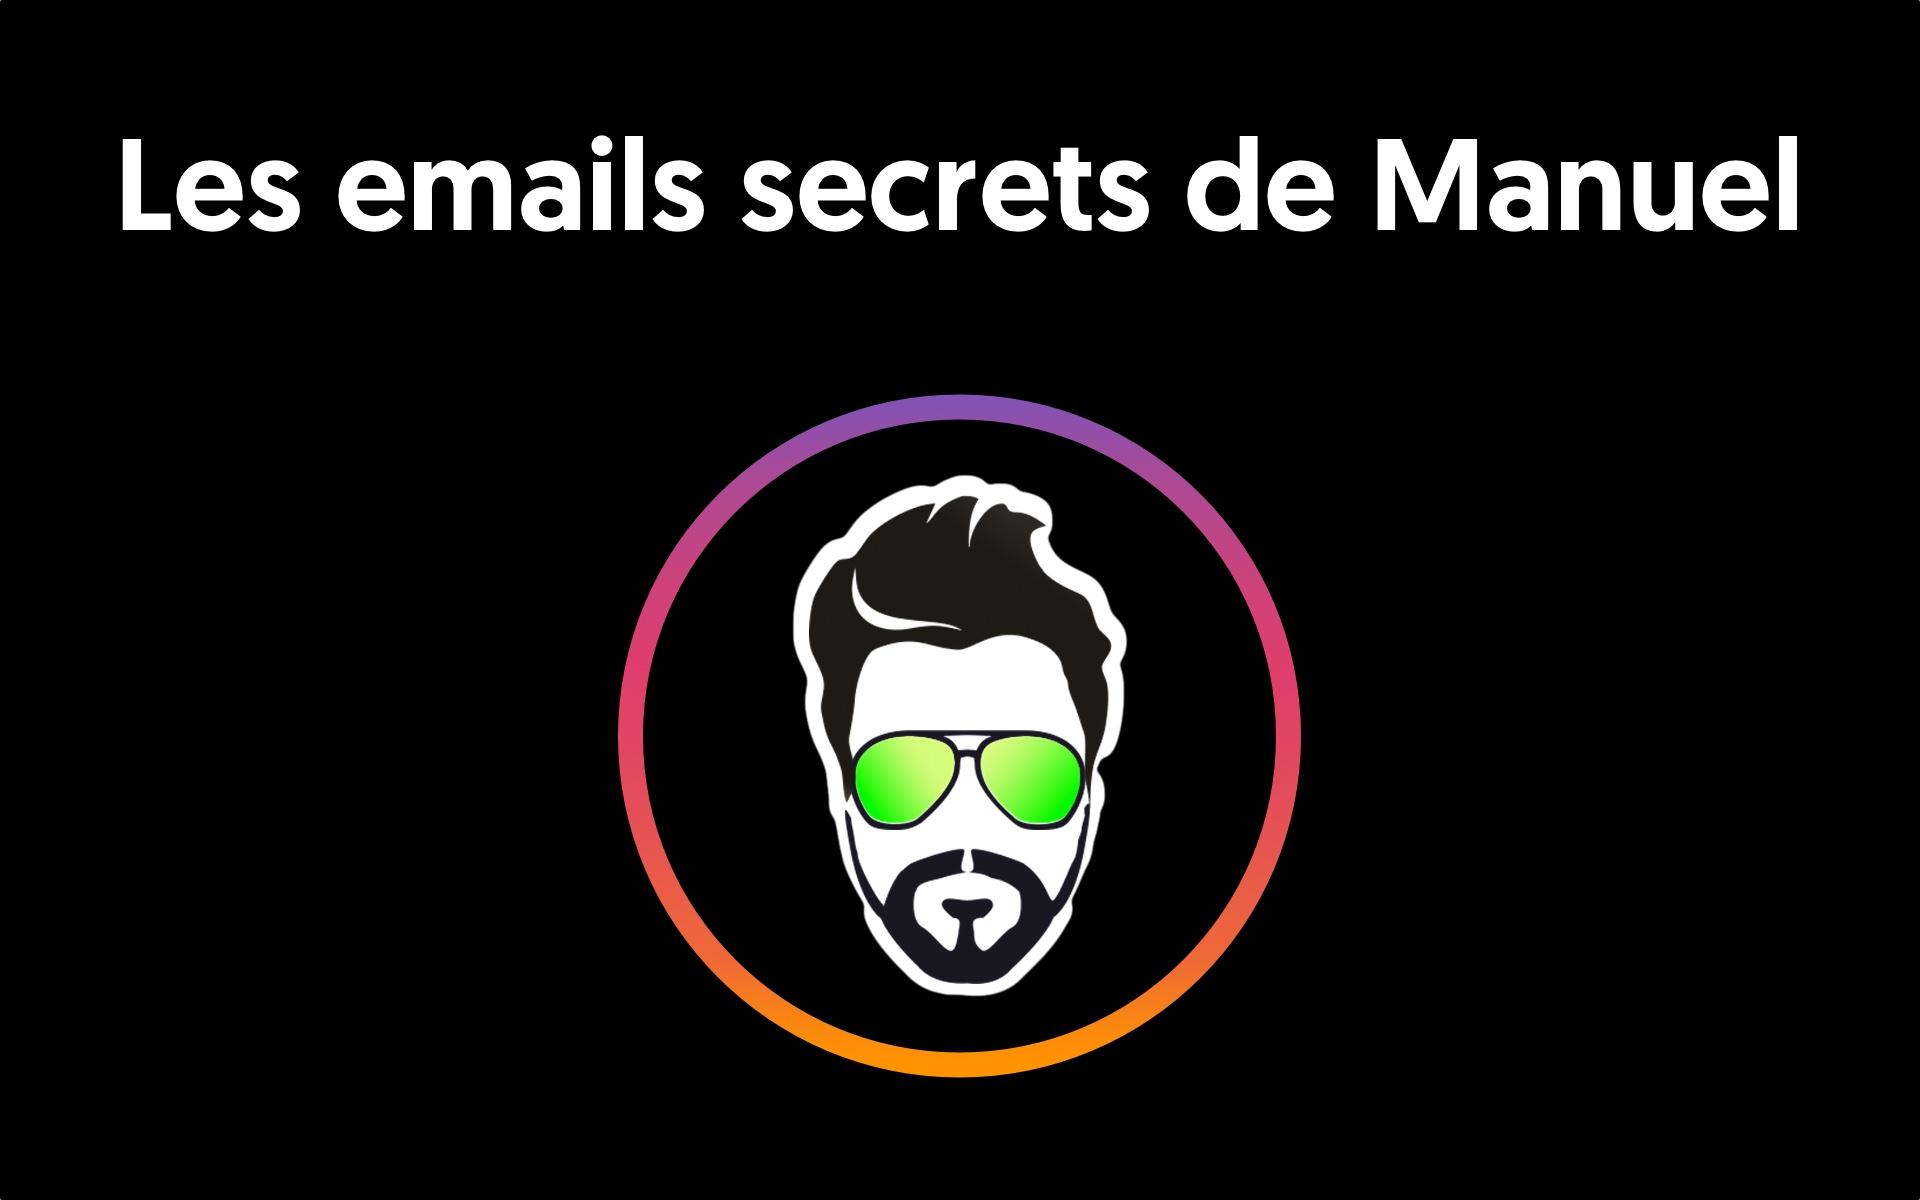 Les emails secrets de Manuel